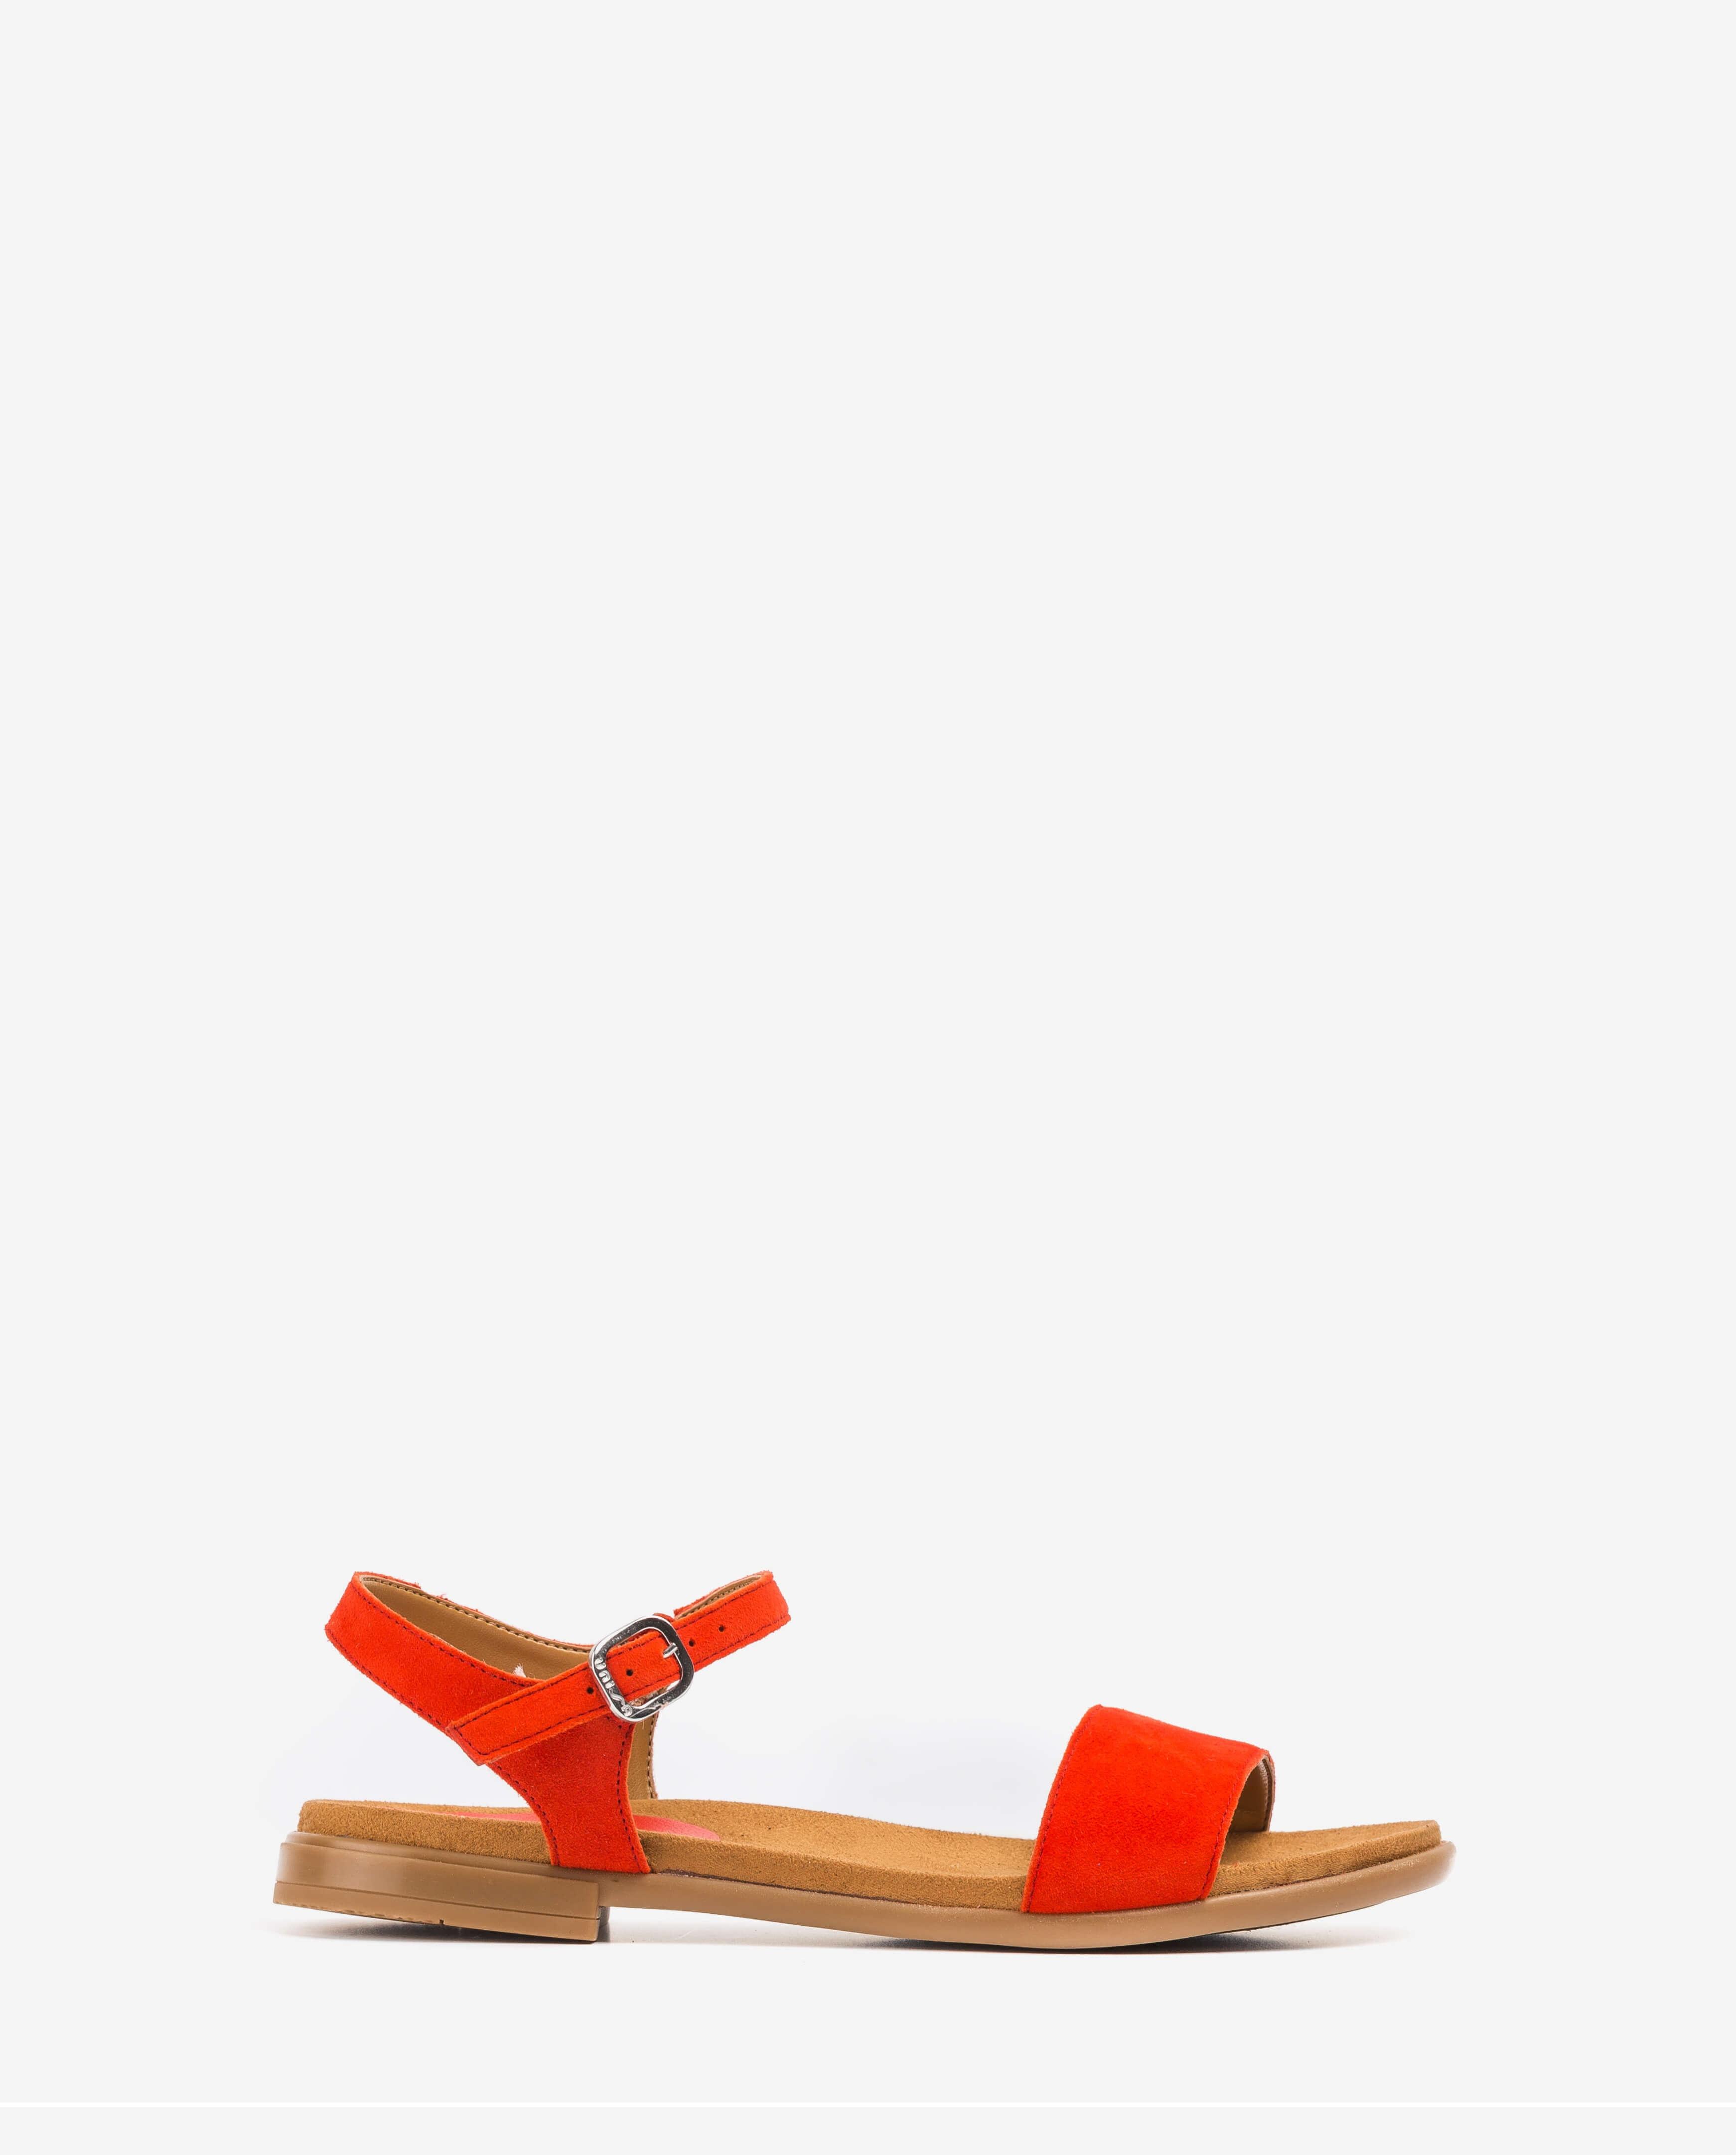 UNISA Little girls coral sandals LIRITA_20_C_KS_CAN corallo 2